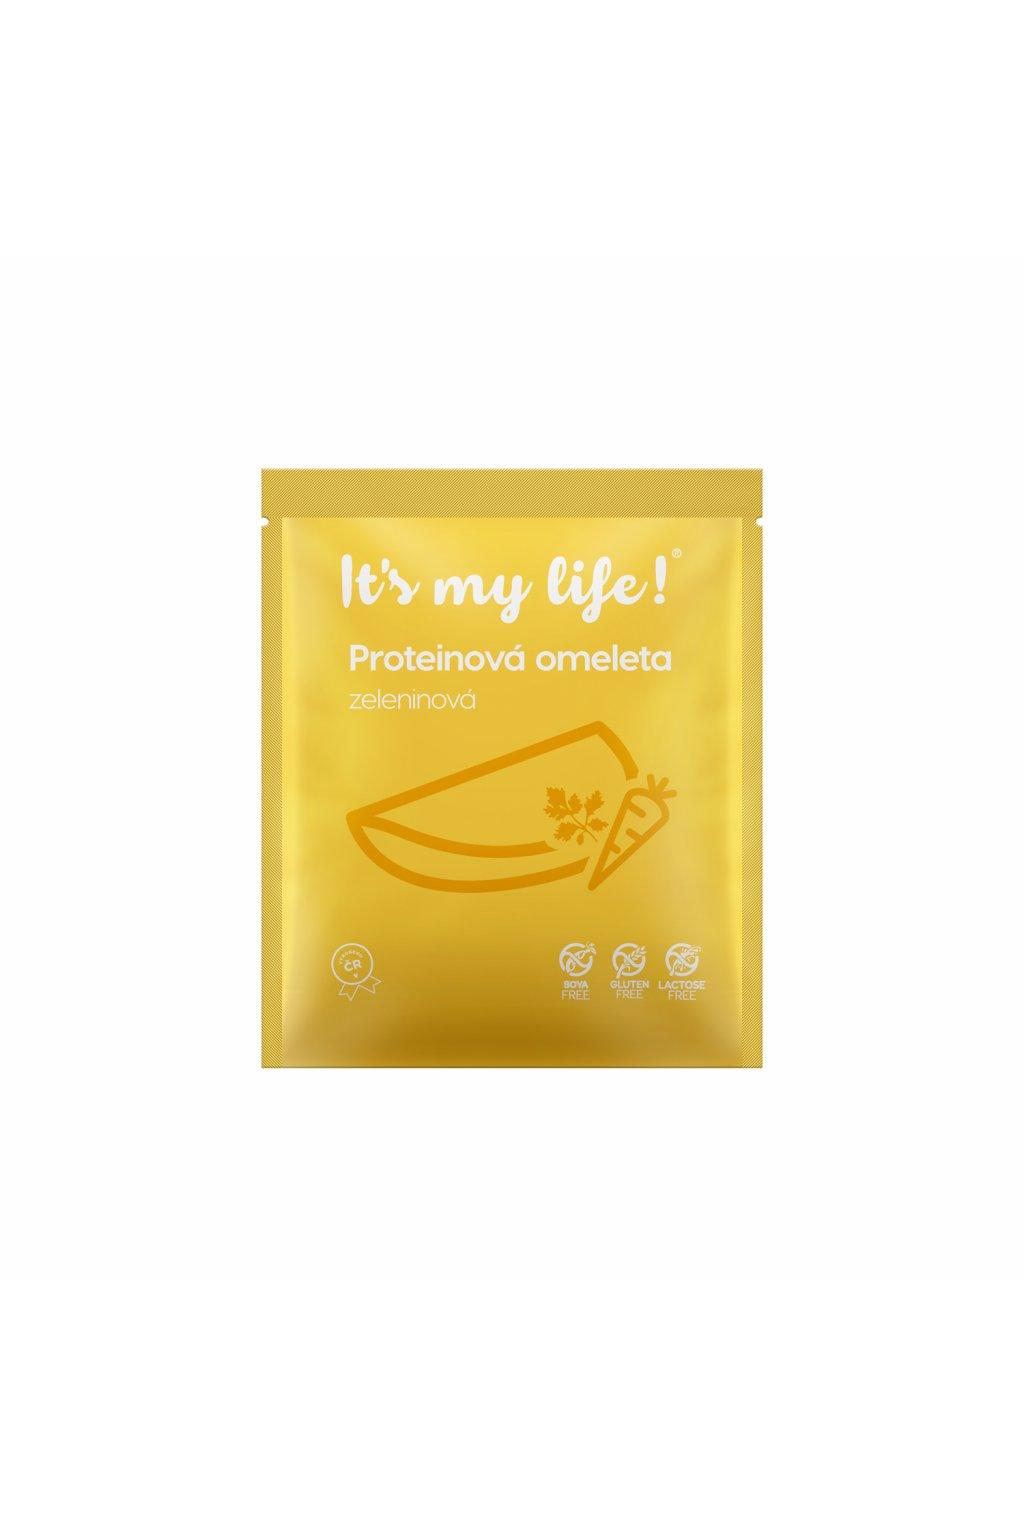 It's my life! Proteinová omeleta houbová (stará receptura) 40g (1 porce)